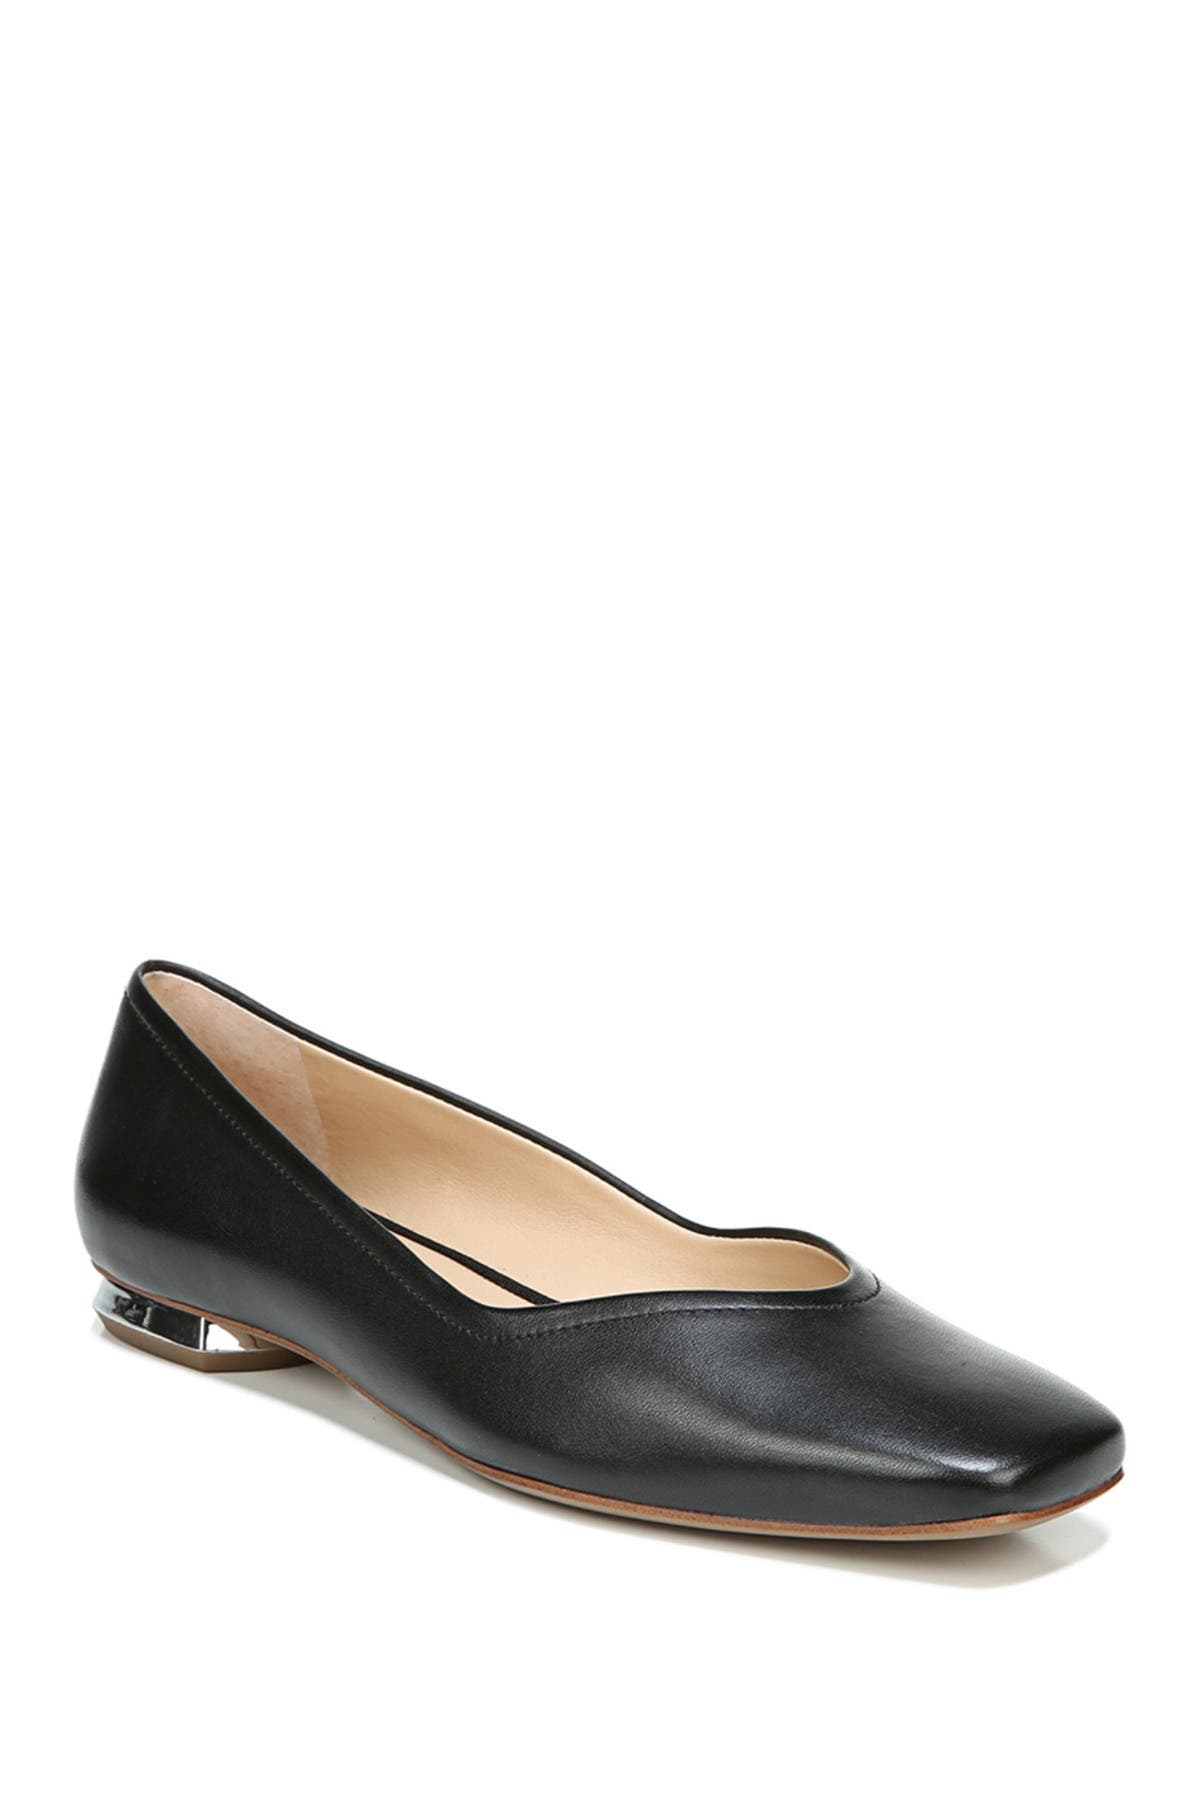 Image of Franco Sarto Astora Leather Flat